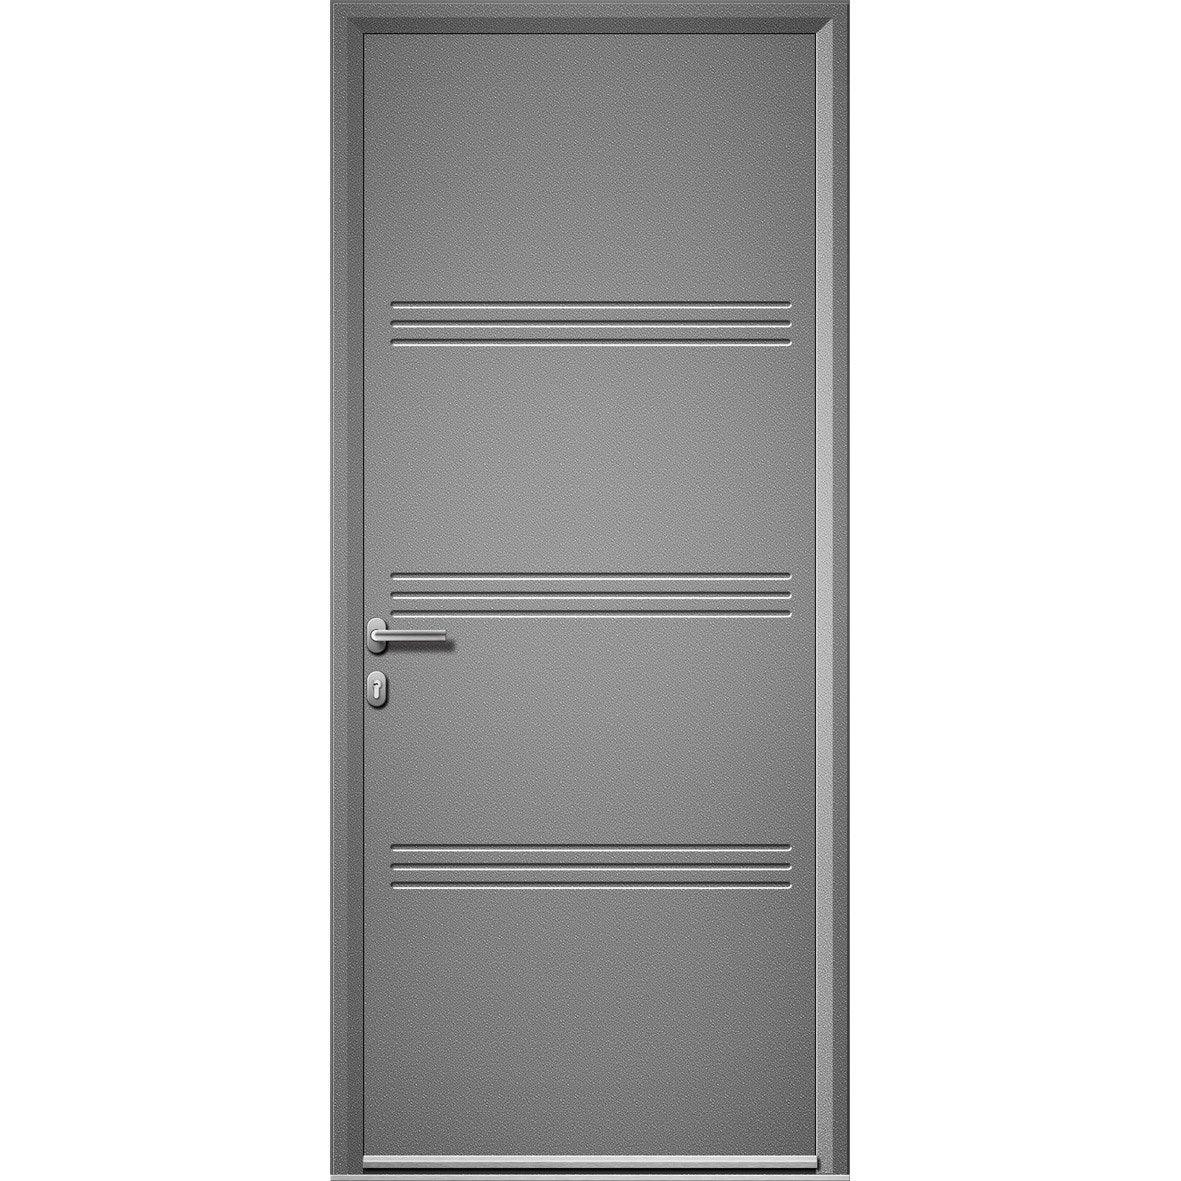 Porte alu leroy merlin porte d 39 entr e sur mesure en - Volet roulant porte d entree leroy merlin ...